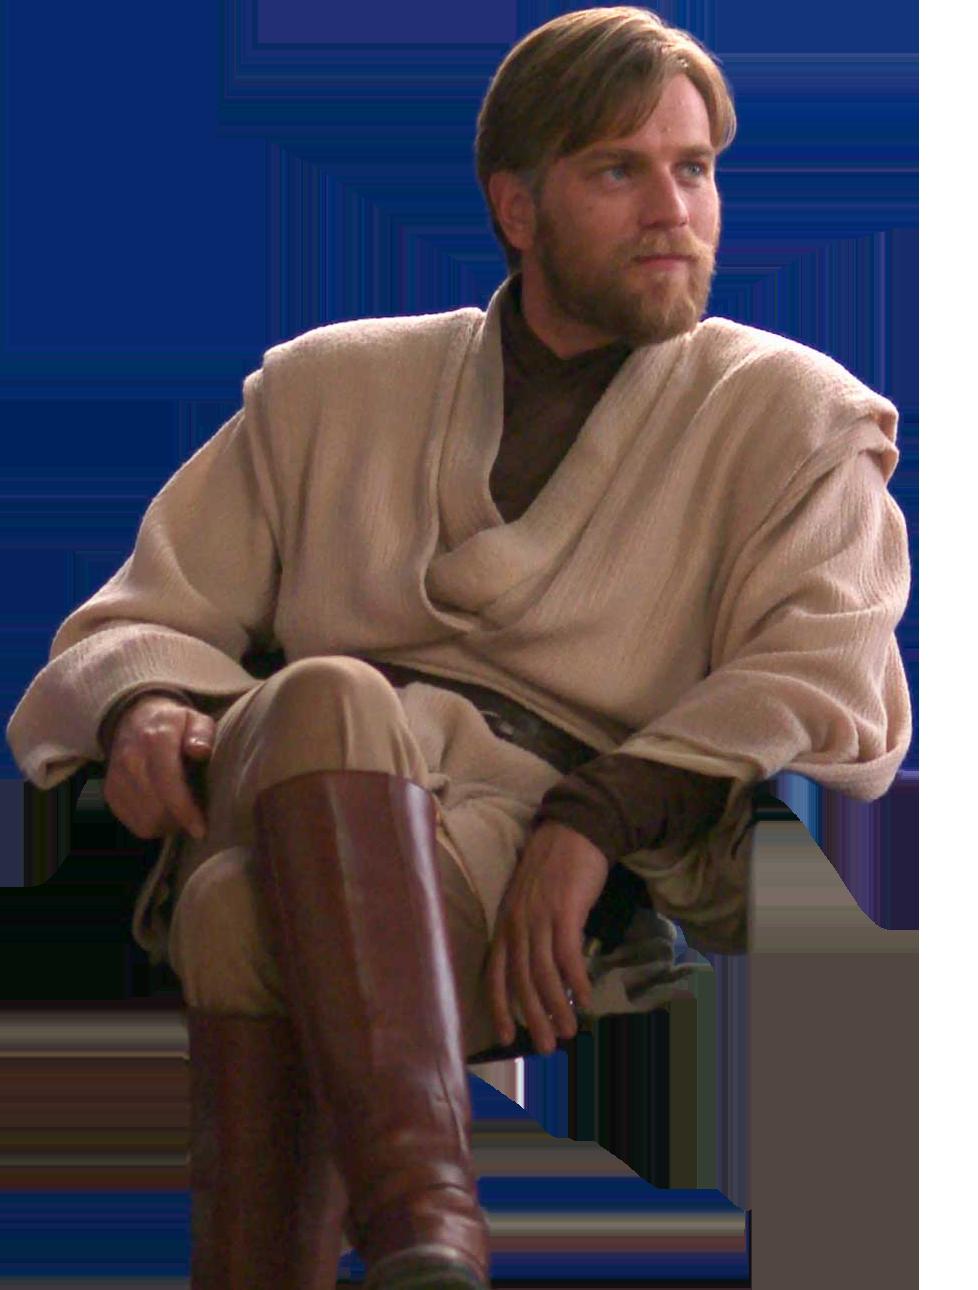 Obi-Wan Kenobi Sitting | #cutouts | Pinterest